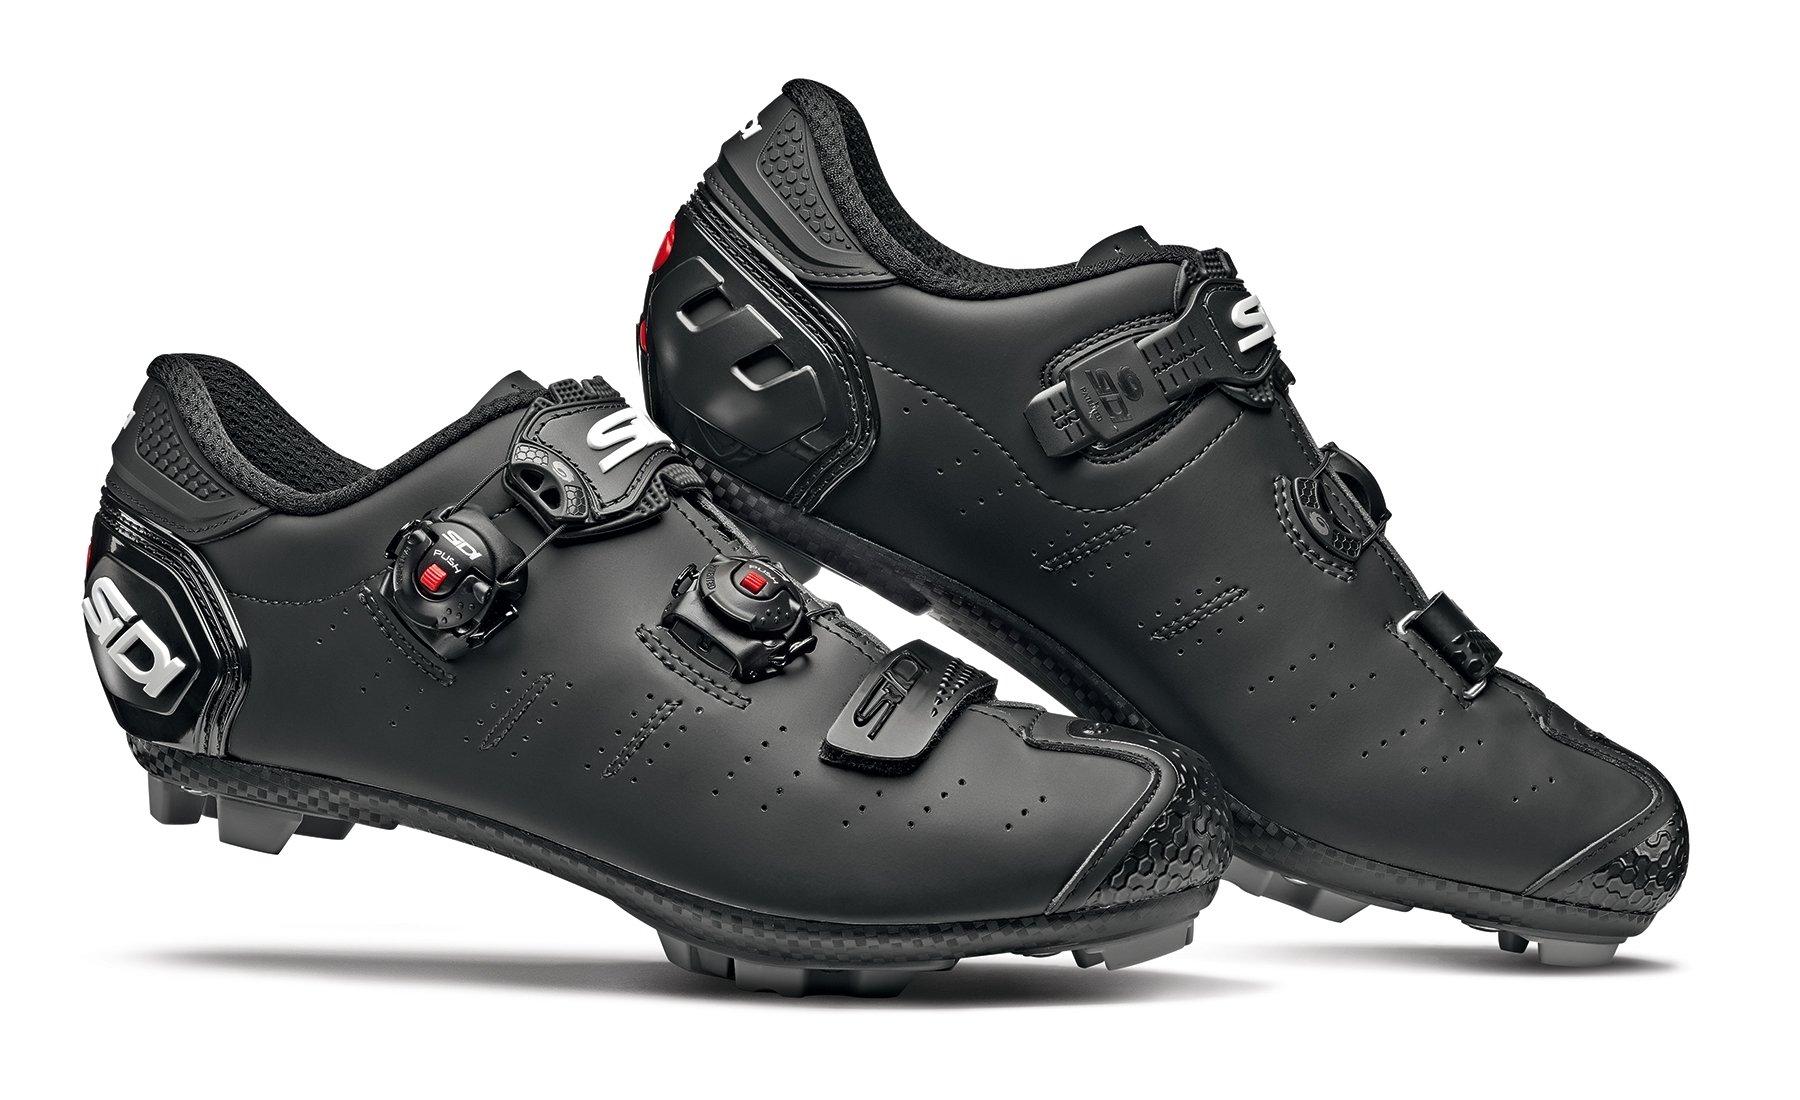 Sidi Dragon 5 SRS Matt MTB Shoes - Matt Black | Shoes and overlays